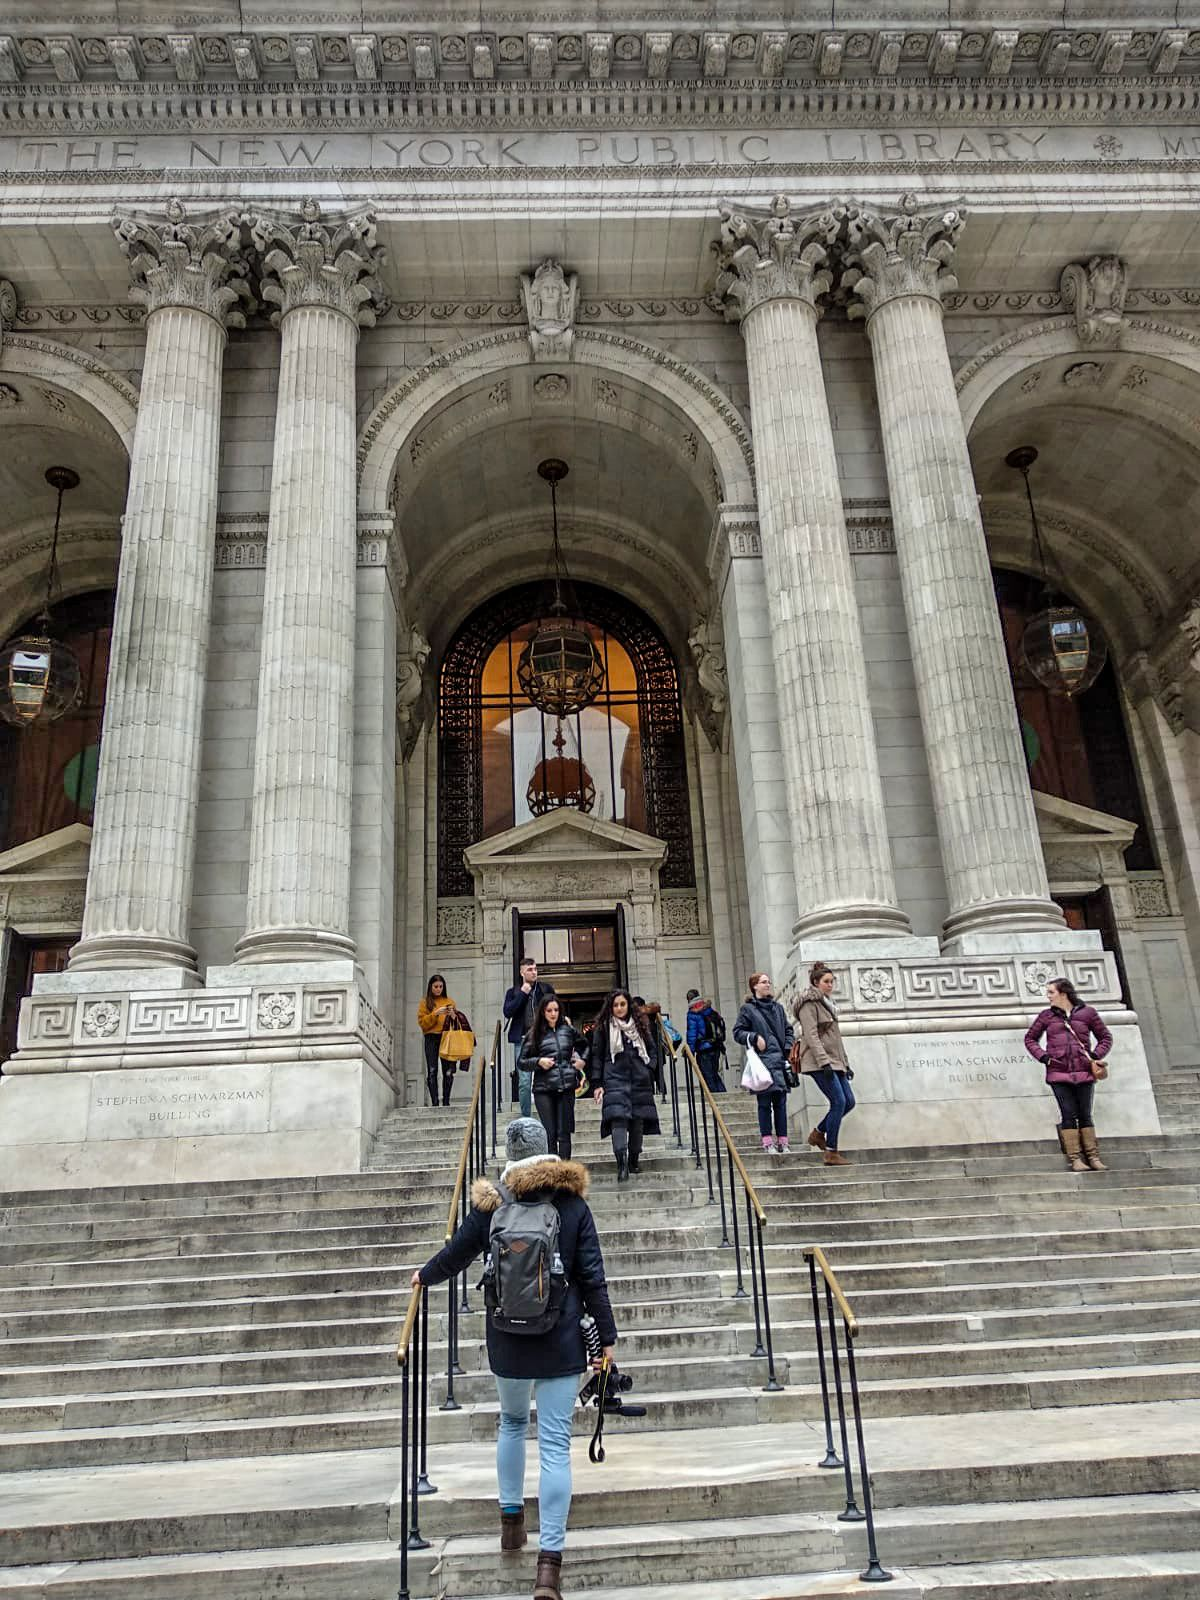 Biblioteca Pública de Nueva York, Ruta andando por Manhattan